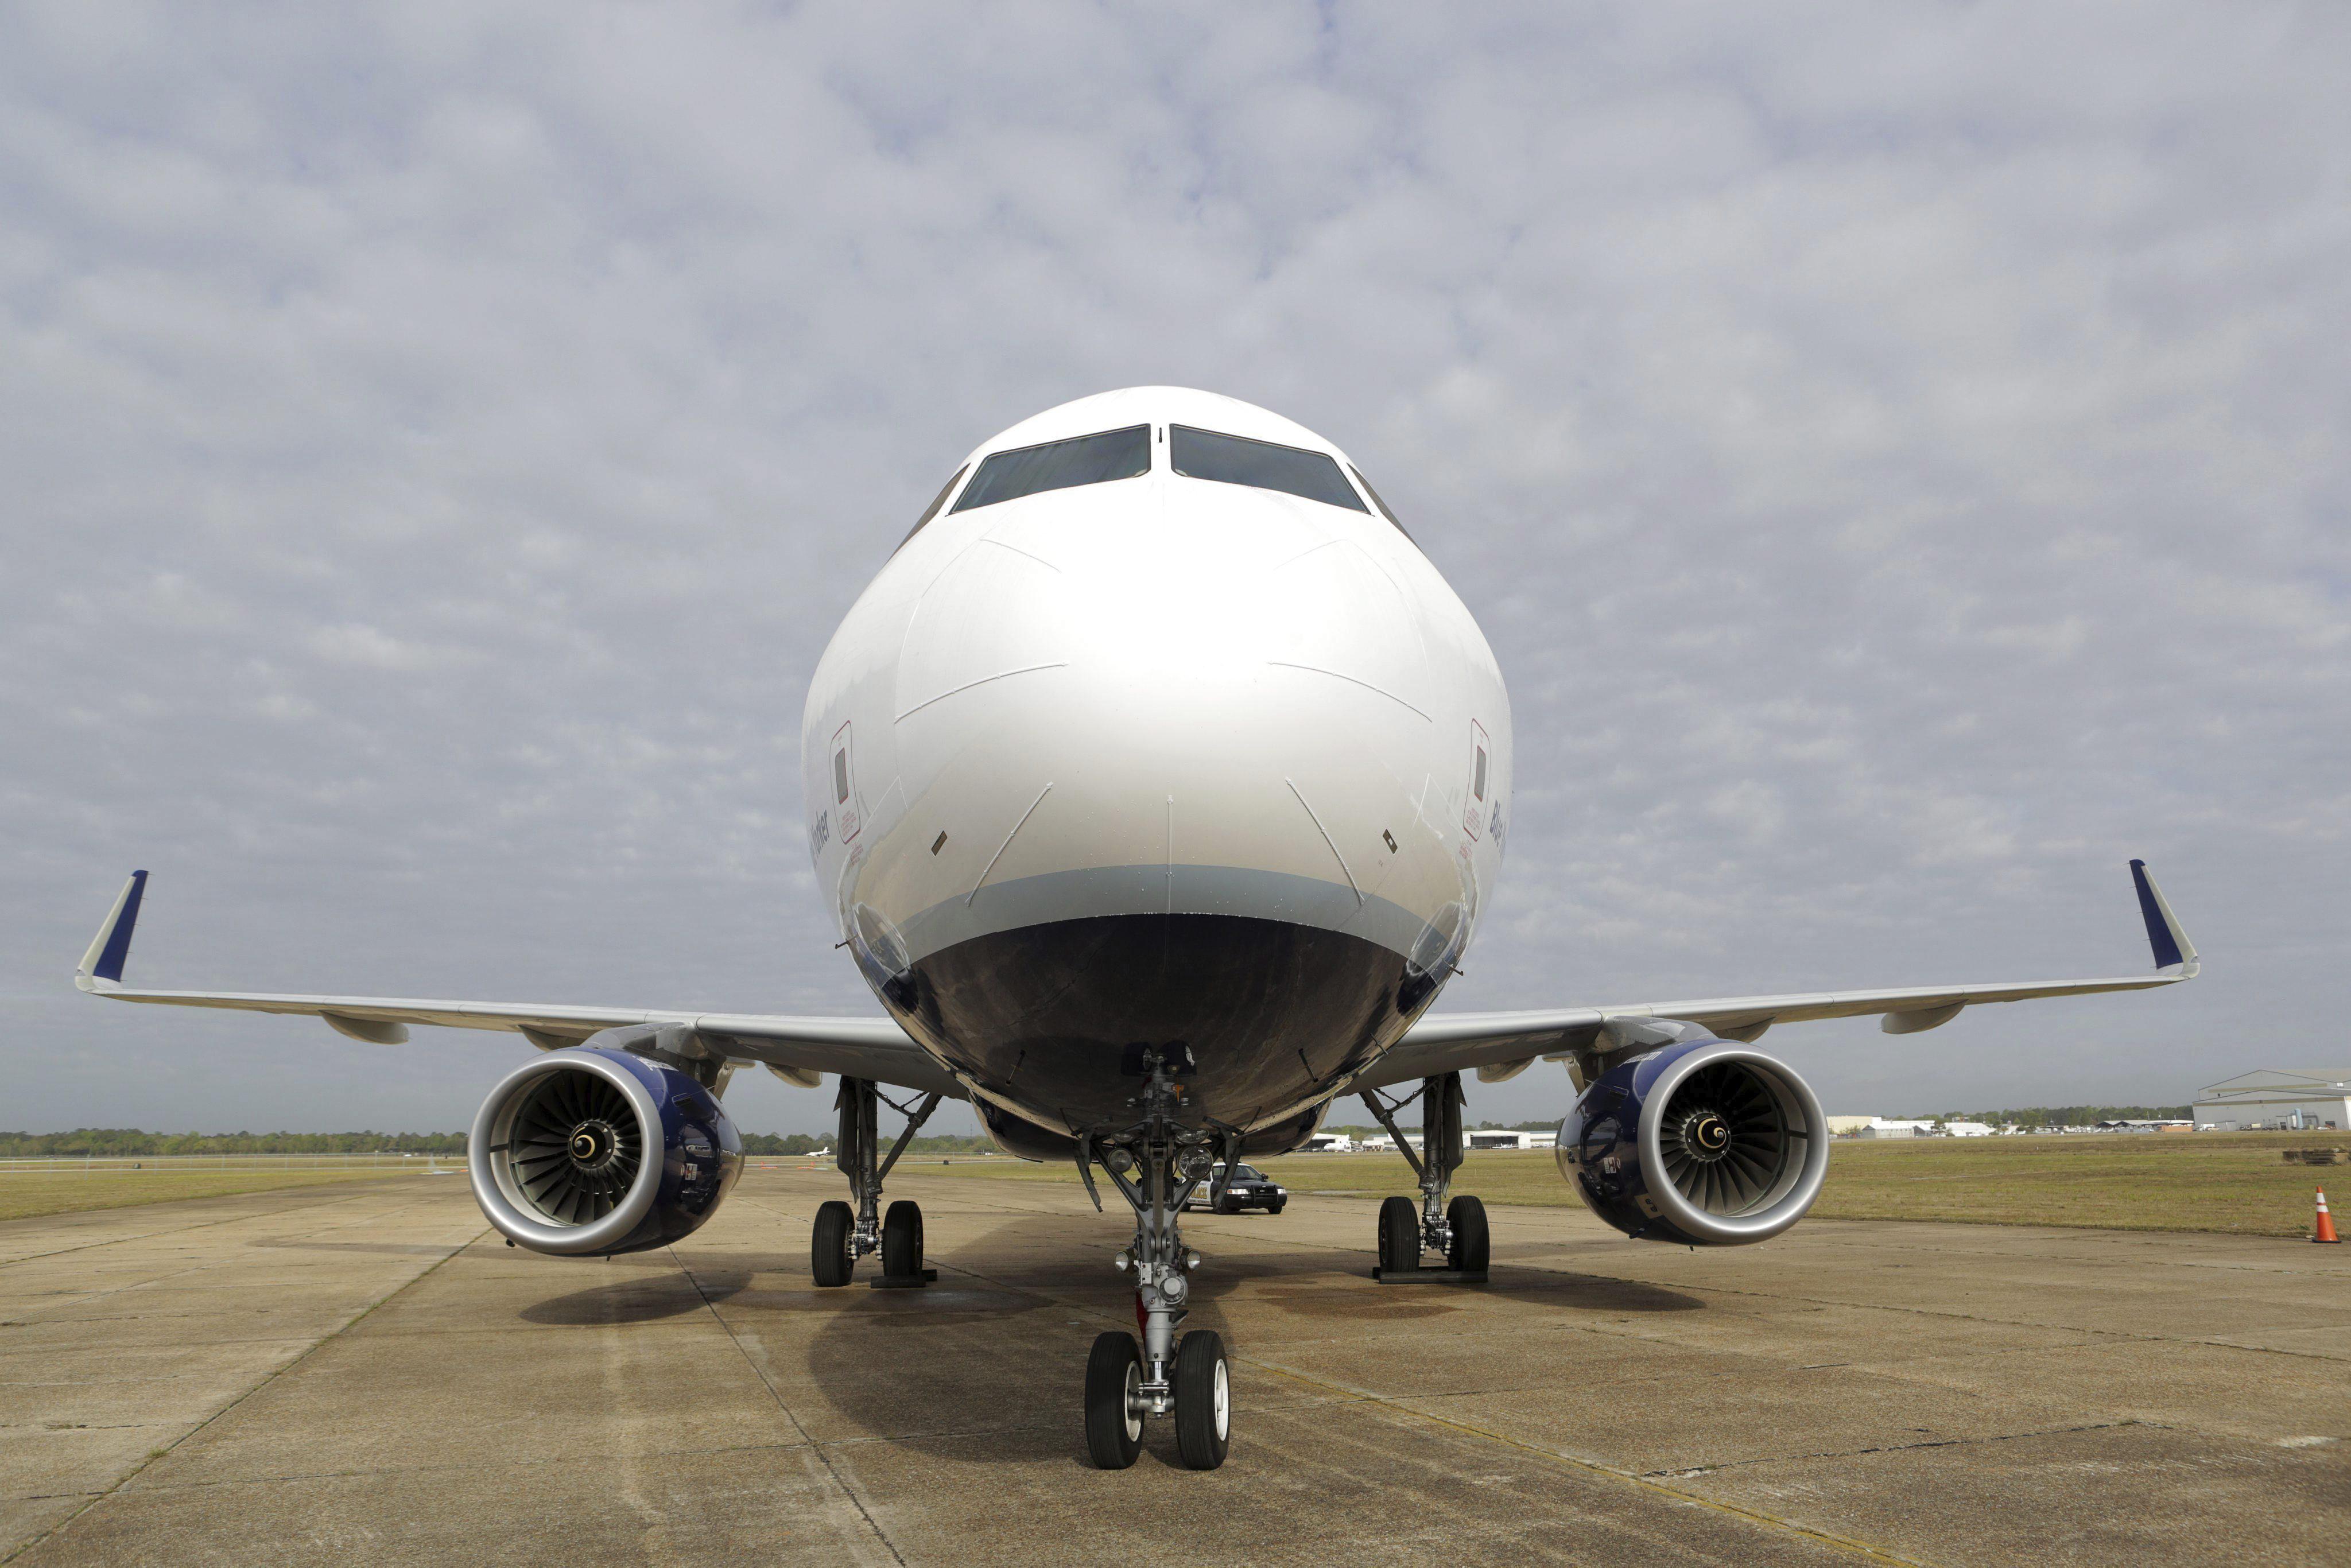 Air China encarga 100 aviones Airbus A320 por 8.800 millones de euros